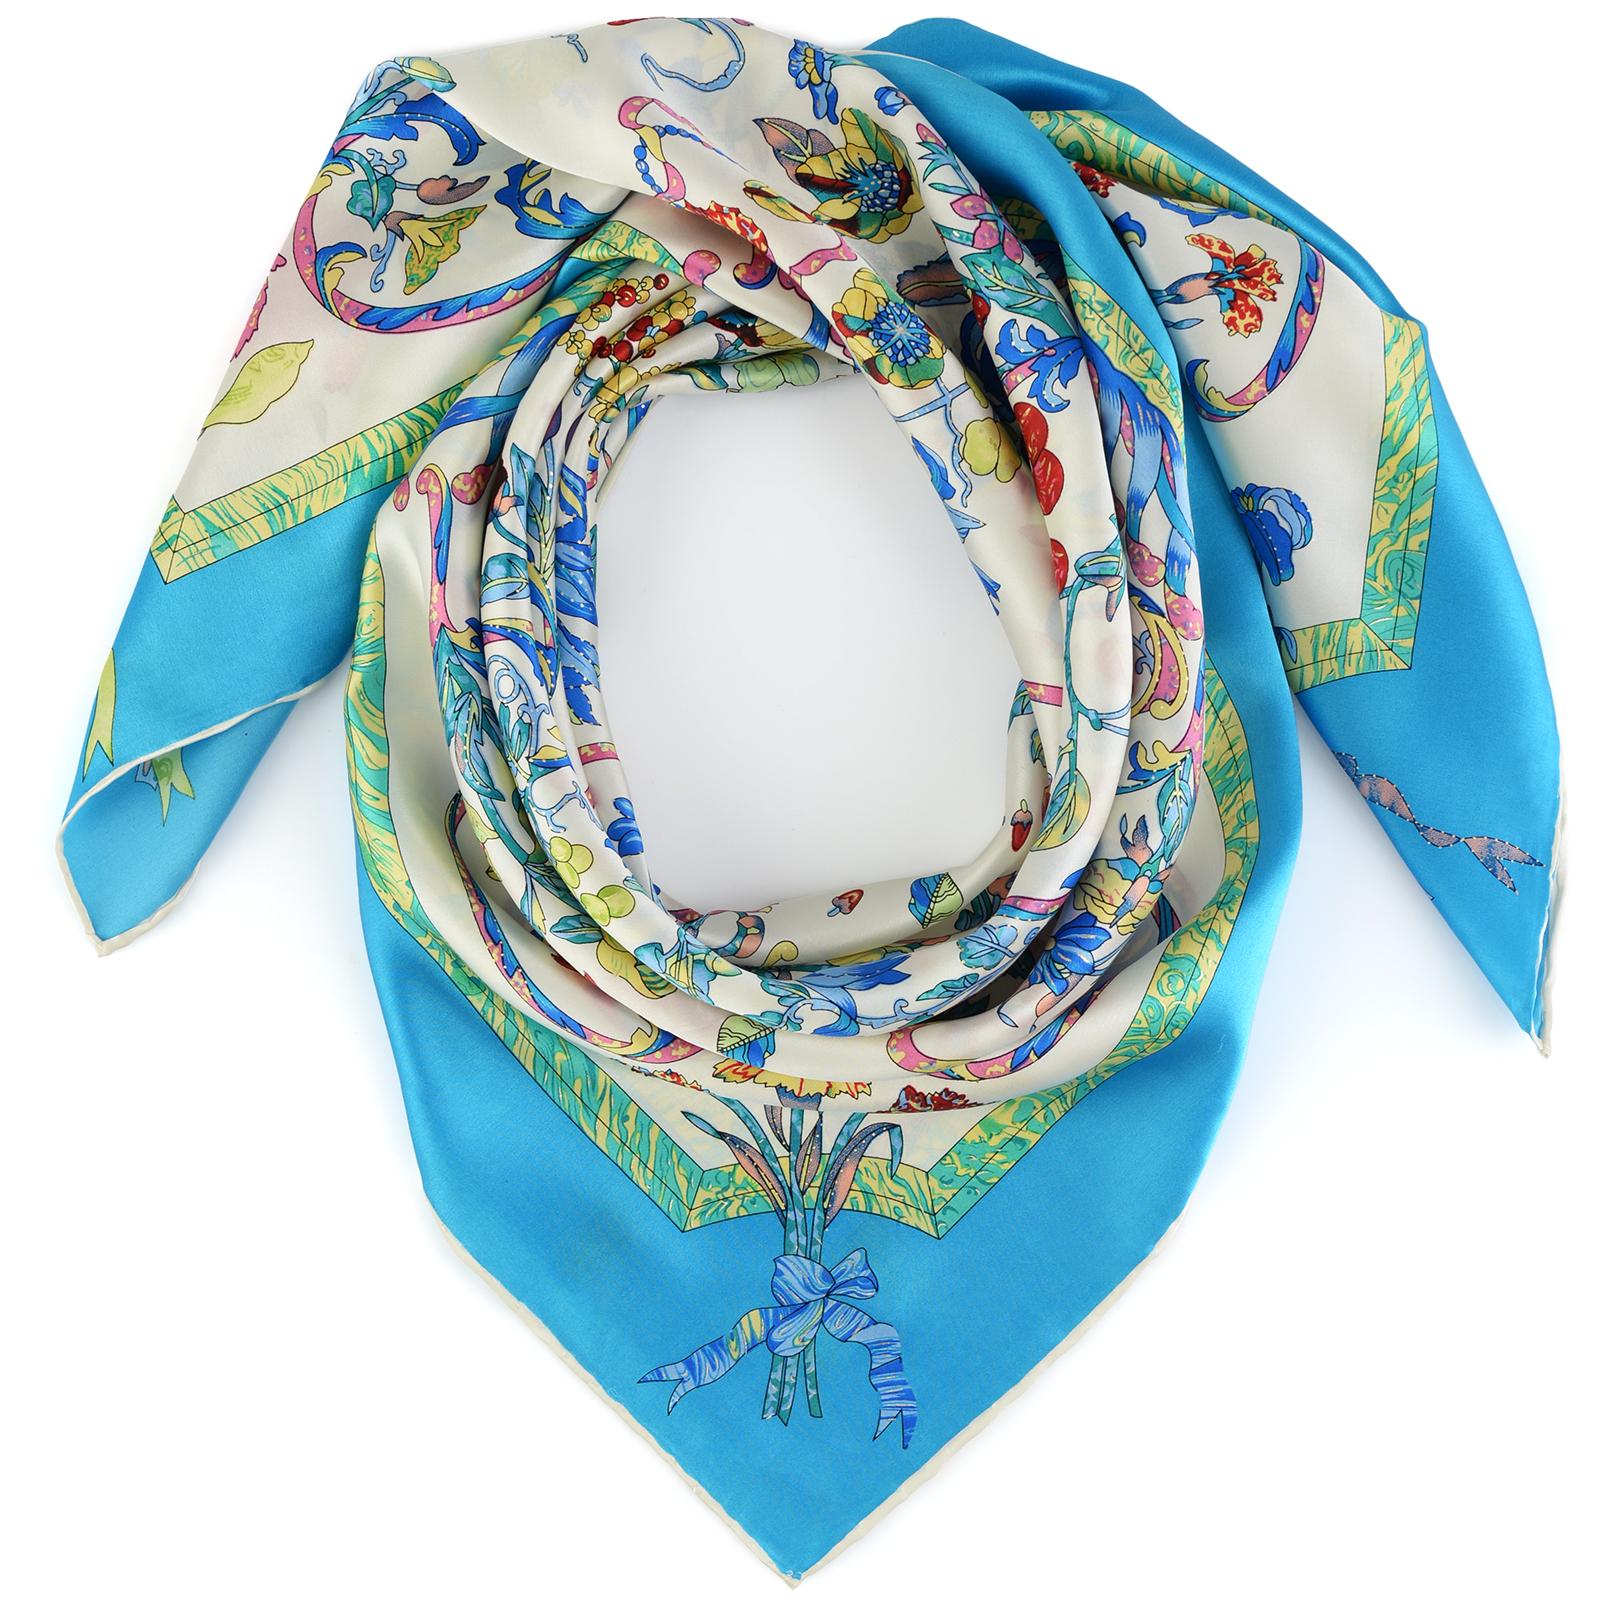 AT-03841-bleu-F16-carre-de-soie-bleu-motifs-vegetaux